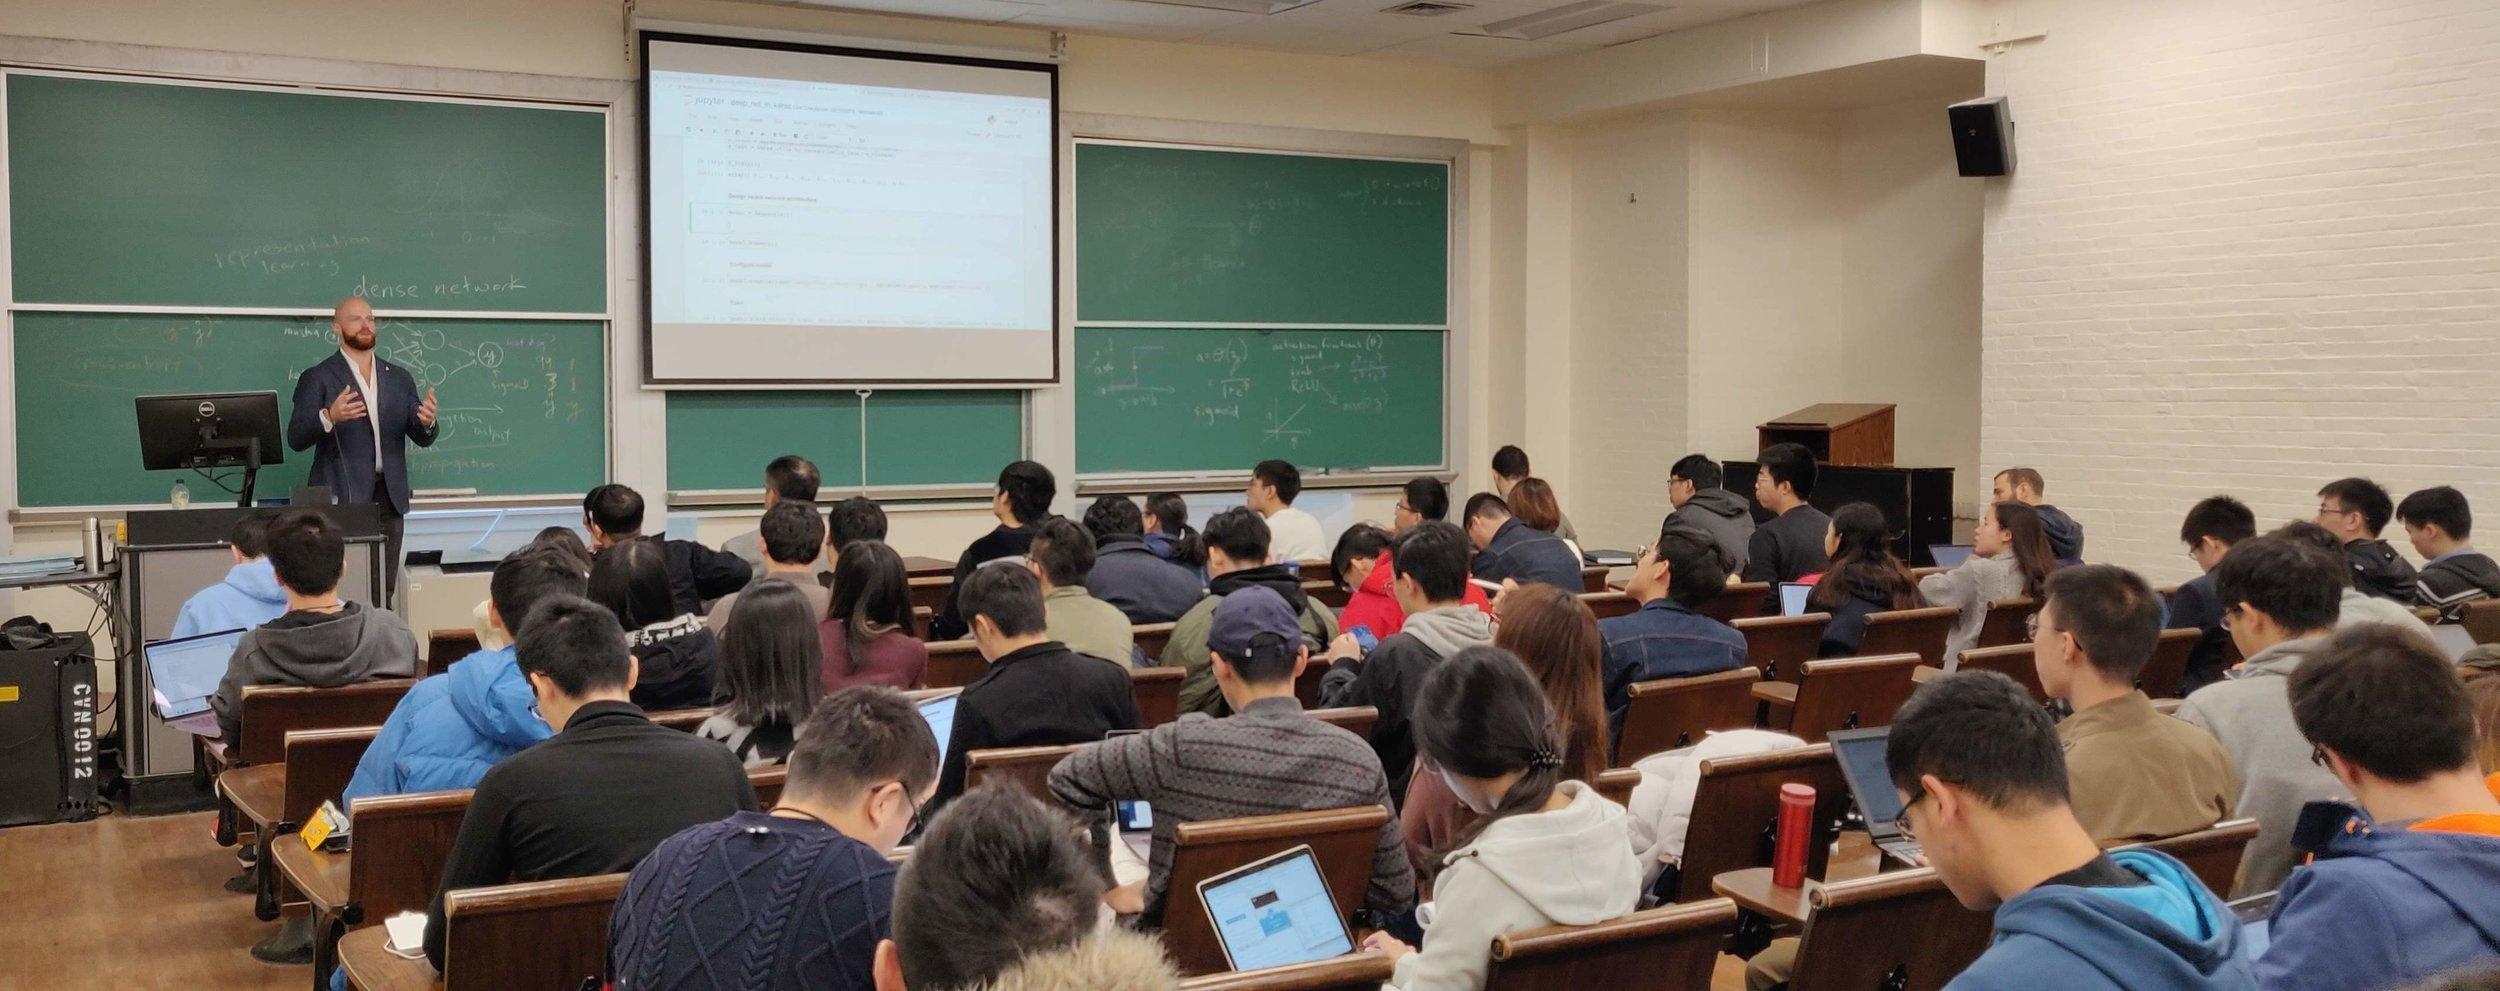 jon-krohn-lecturing-at-columbia-university